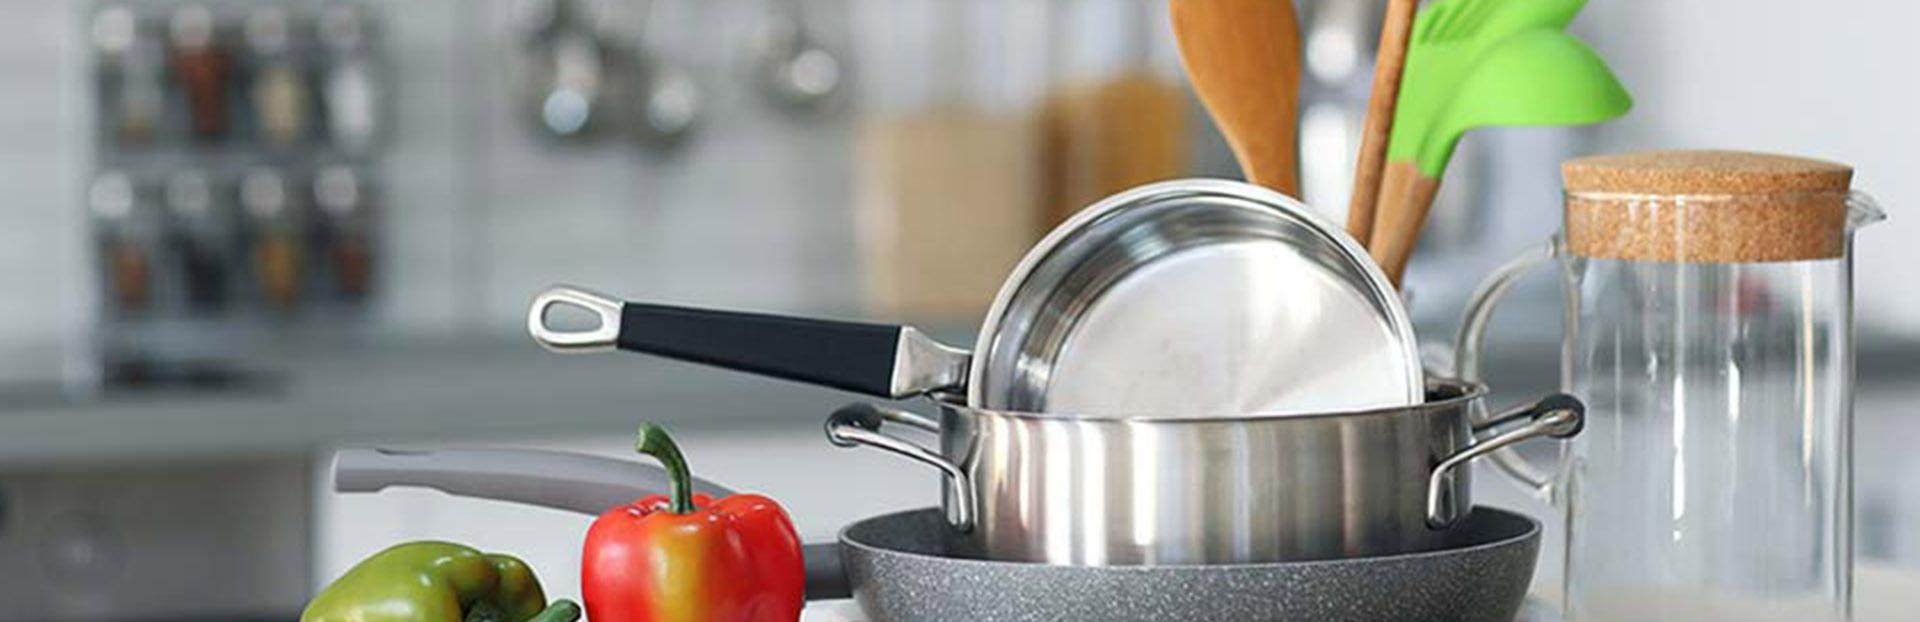 https://www.redcaronline.info/wordpress/wp-content/uploads/2020/08/kitchen-1.jpg